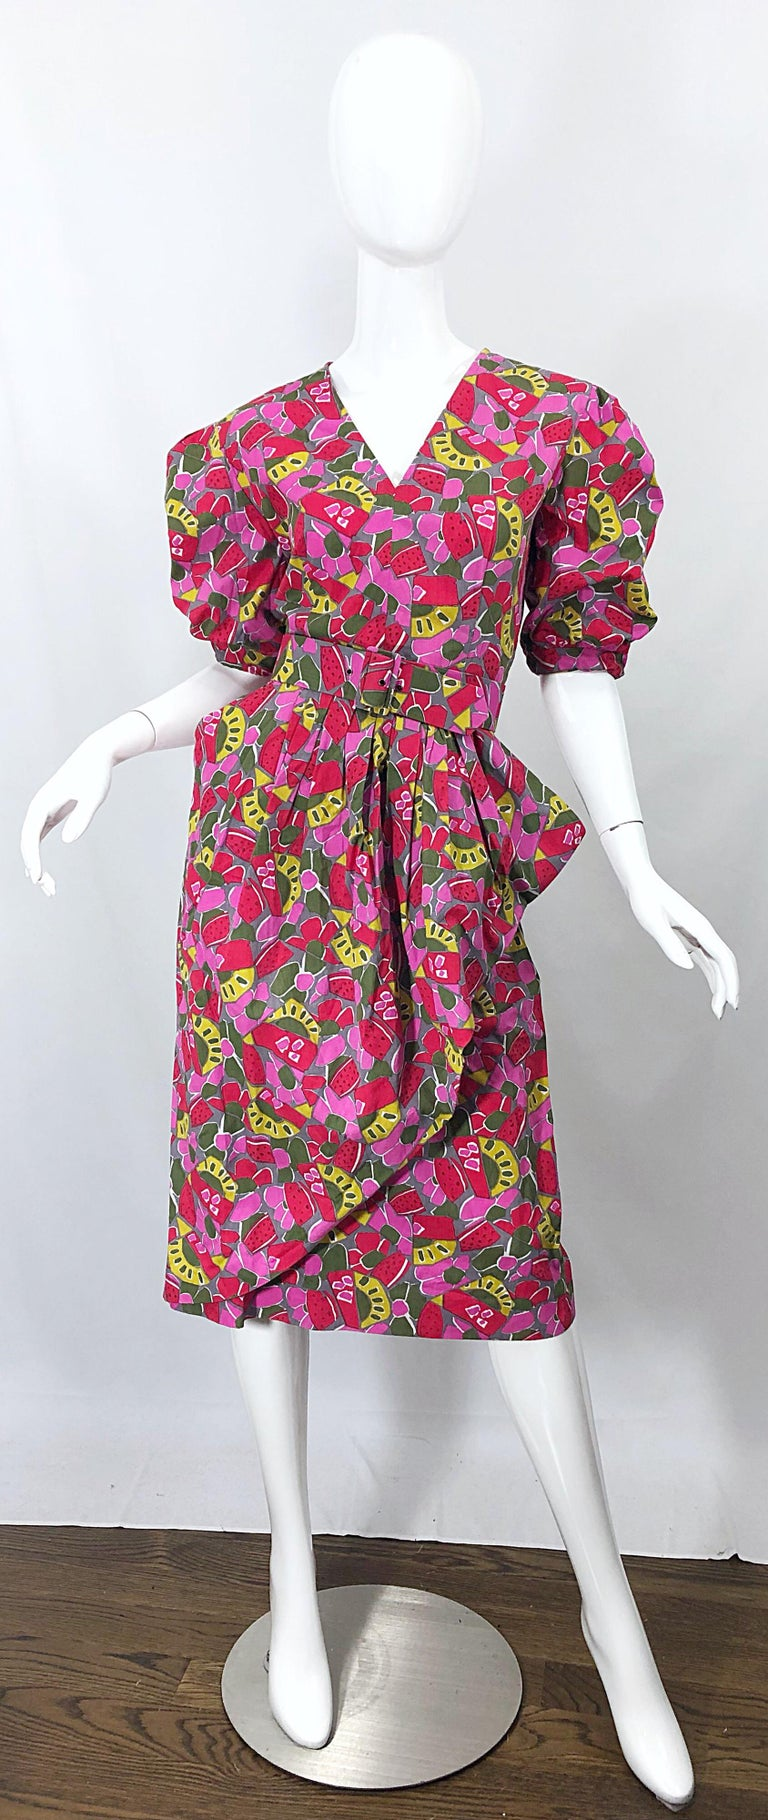 1980s Guy Laroche Size 44 / 12 Novelty Fruit Print Avant Garde Vintage 80s Dress For Sale 8